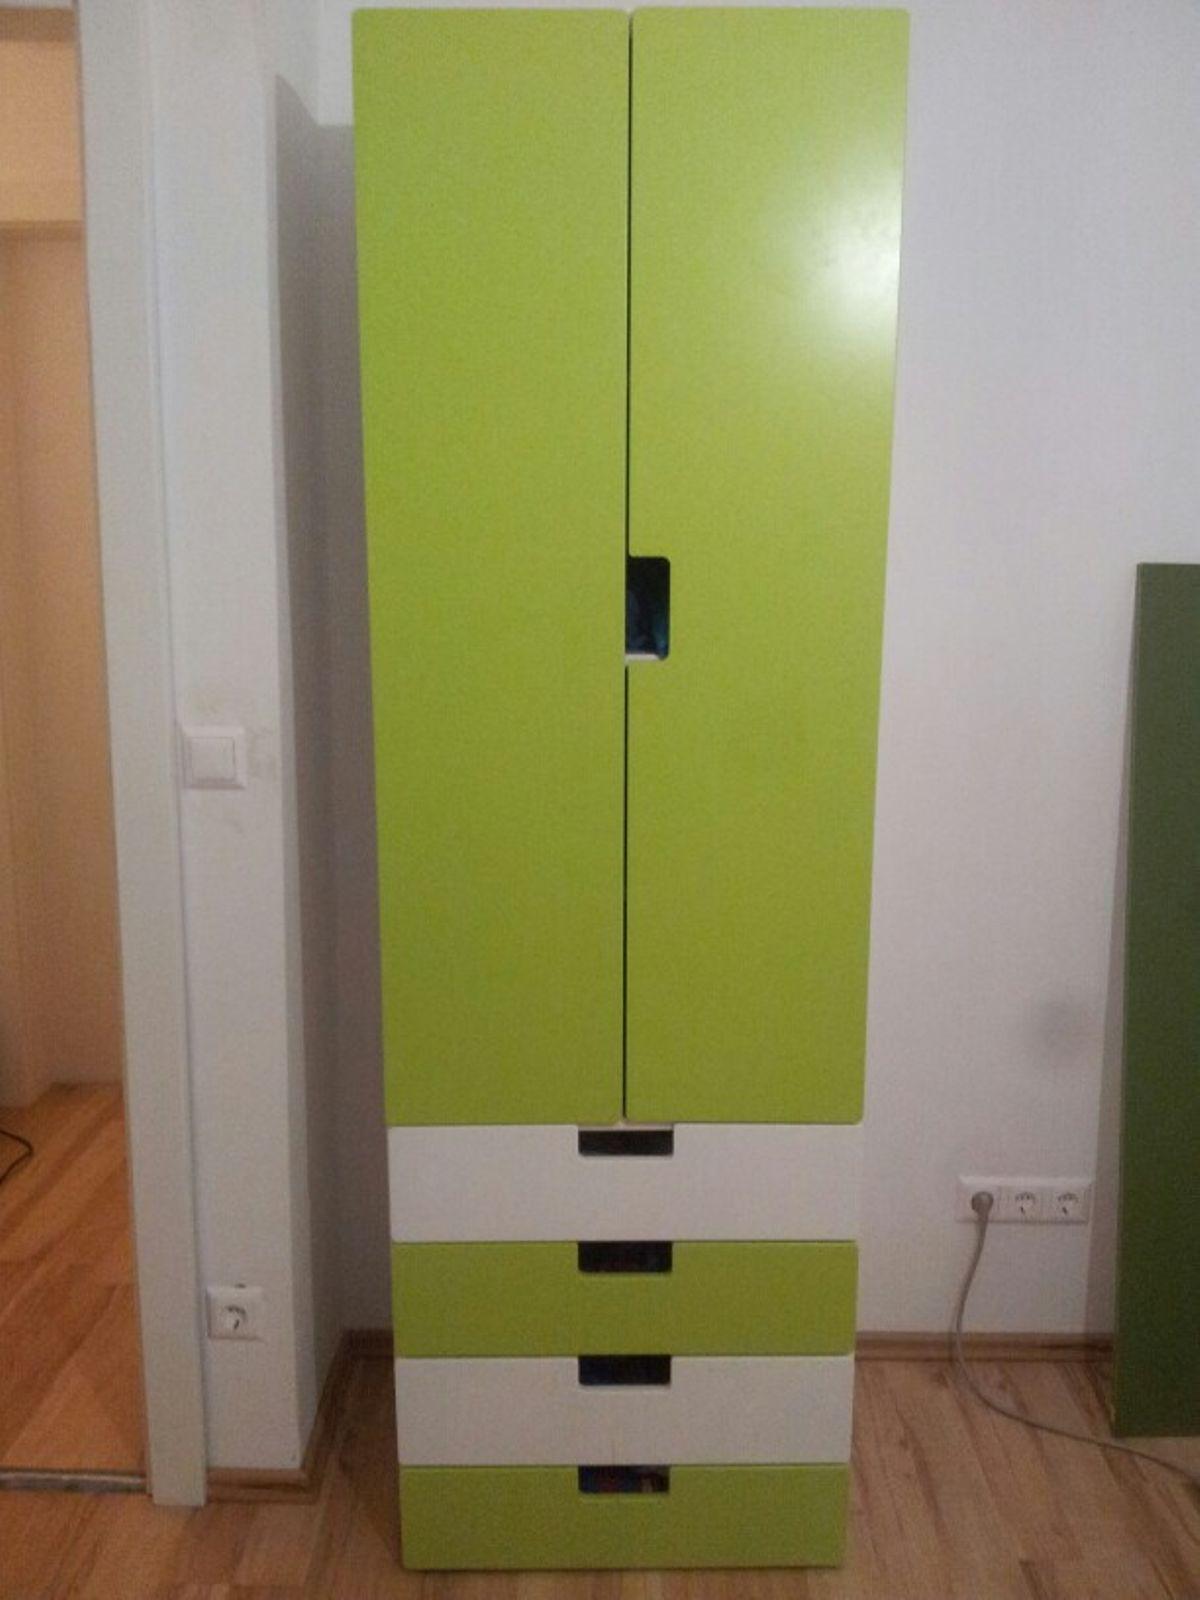 Kinderzimmer Ikea Stuva Schrank